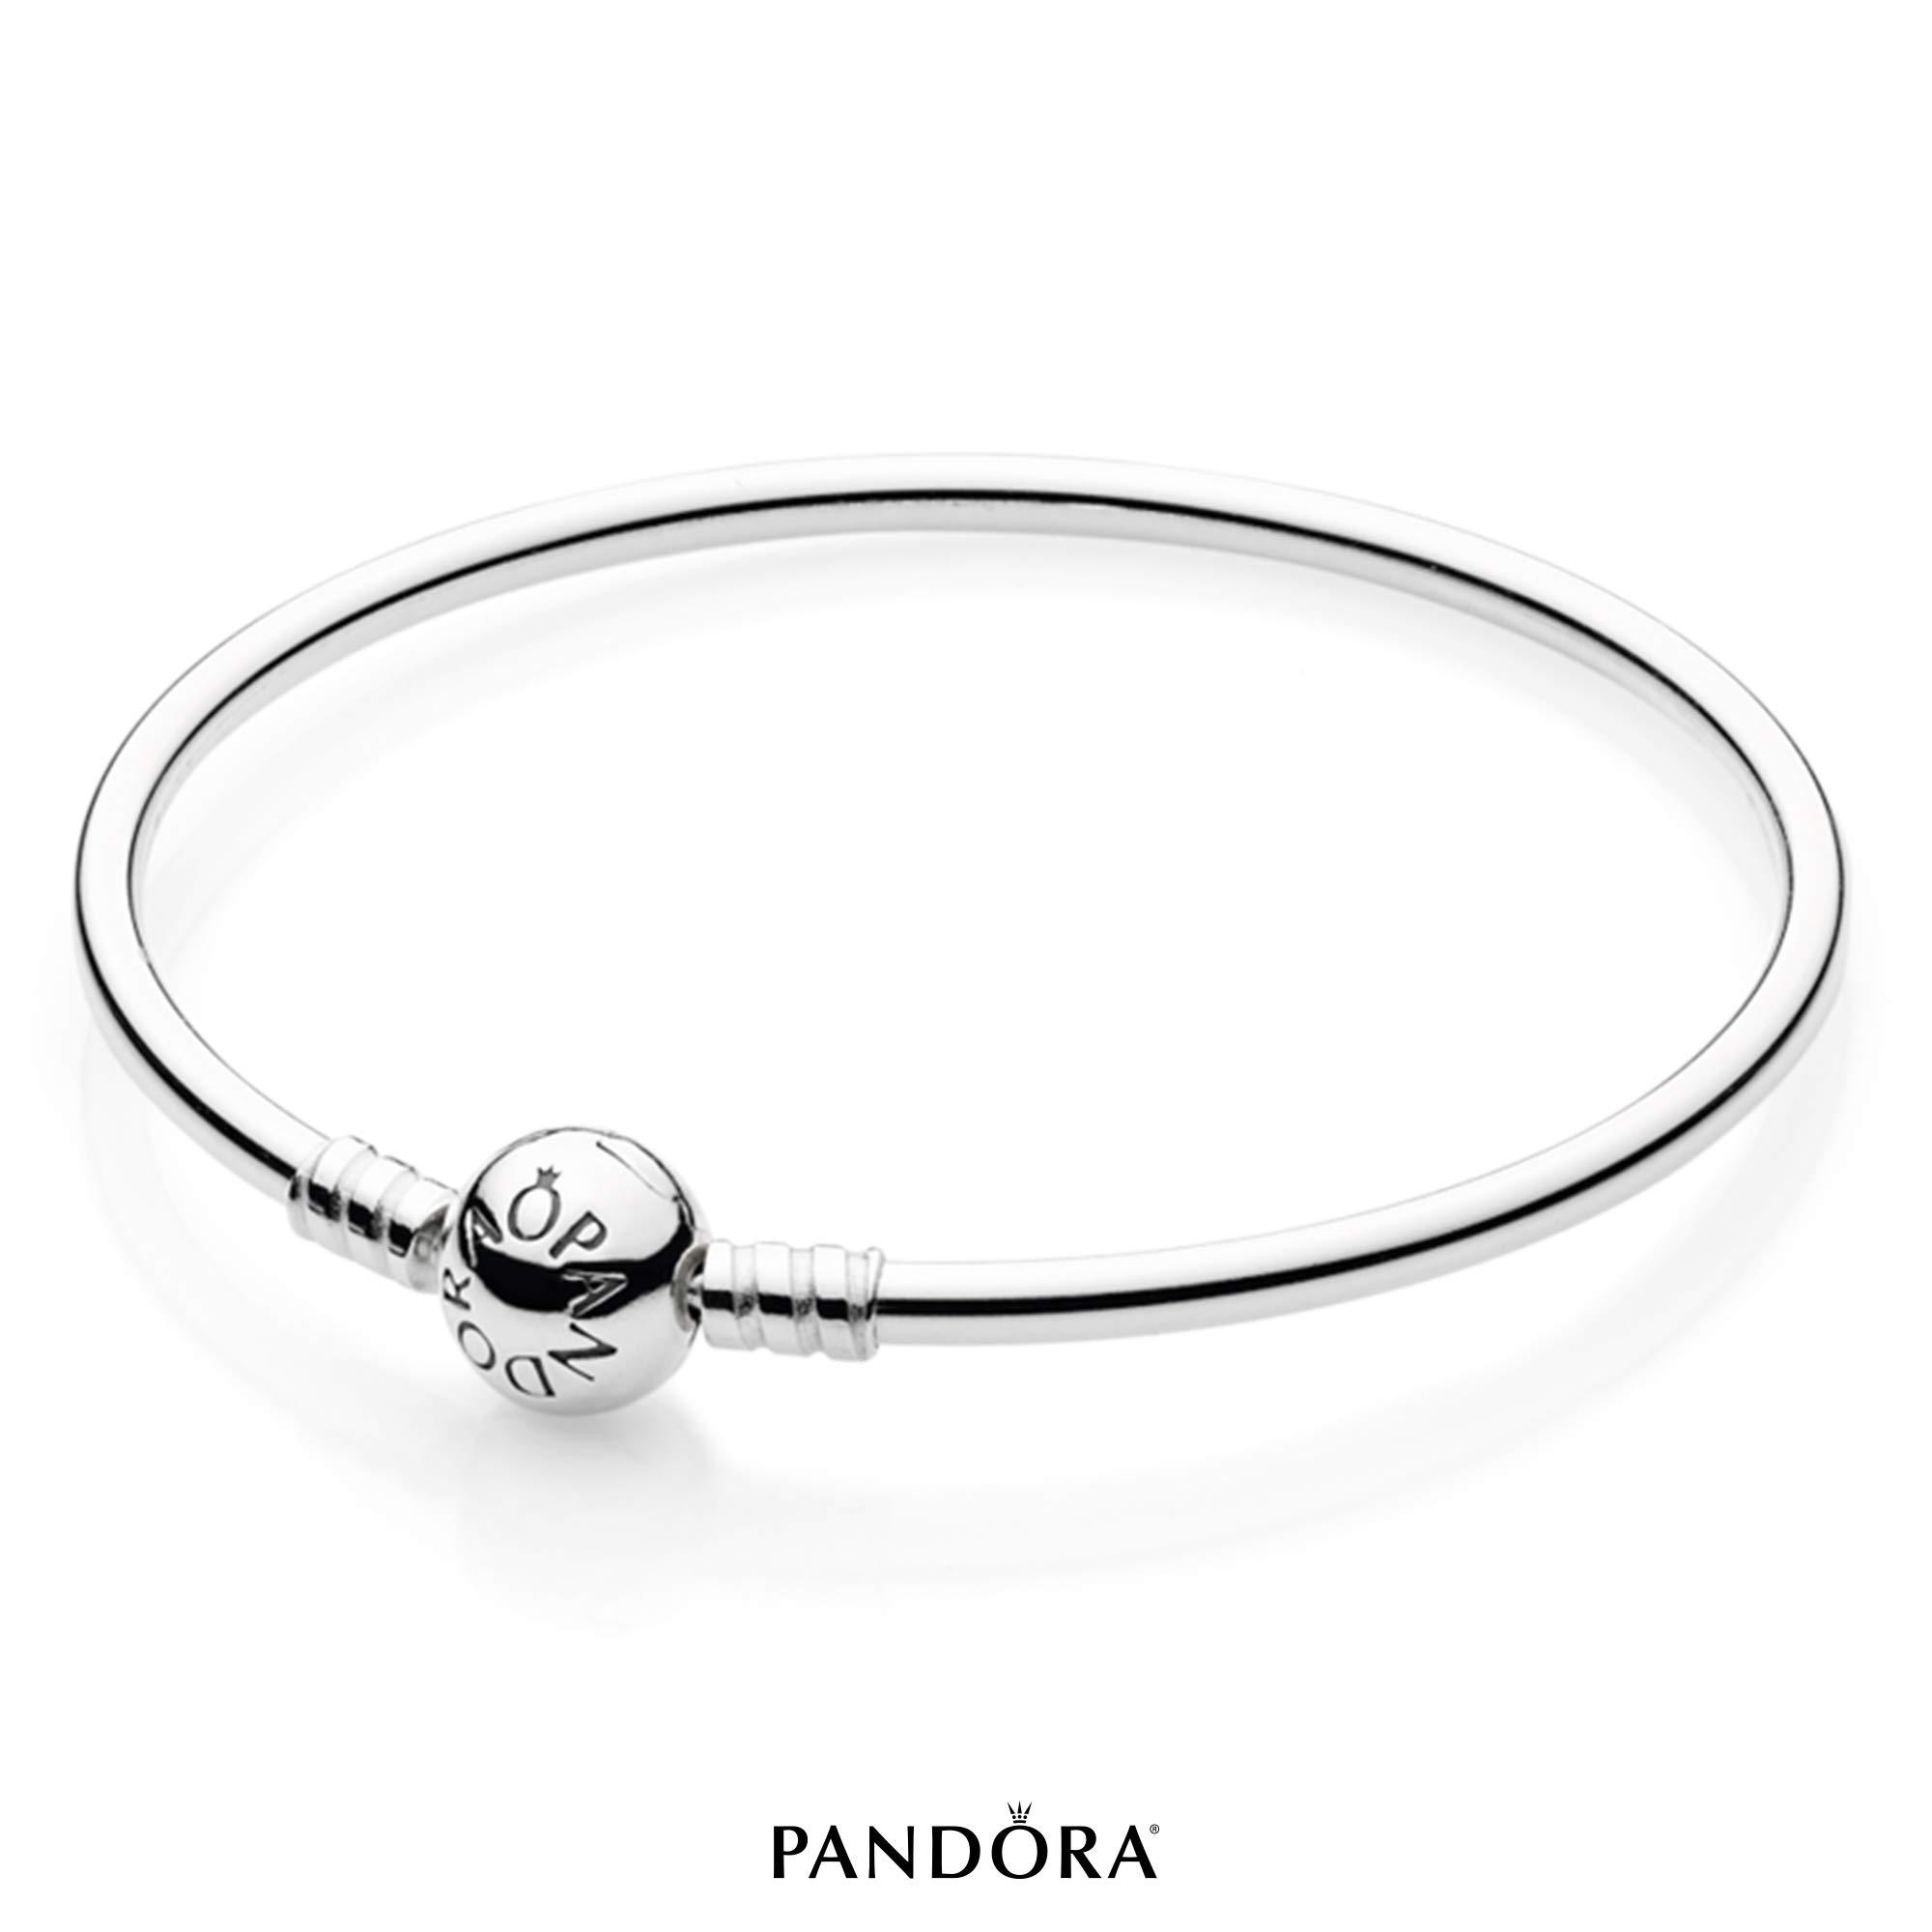 PANDORA Sterling Silver Bangle Bracelet, 7.5 in by PANDORA